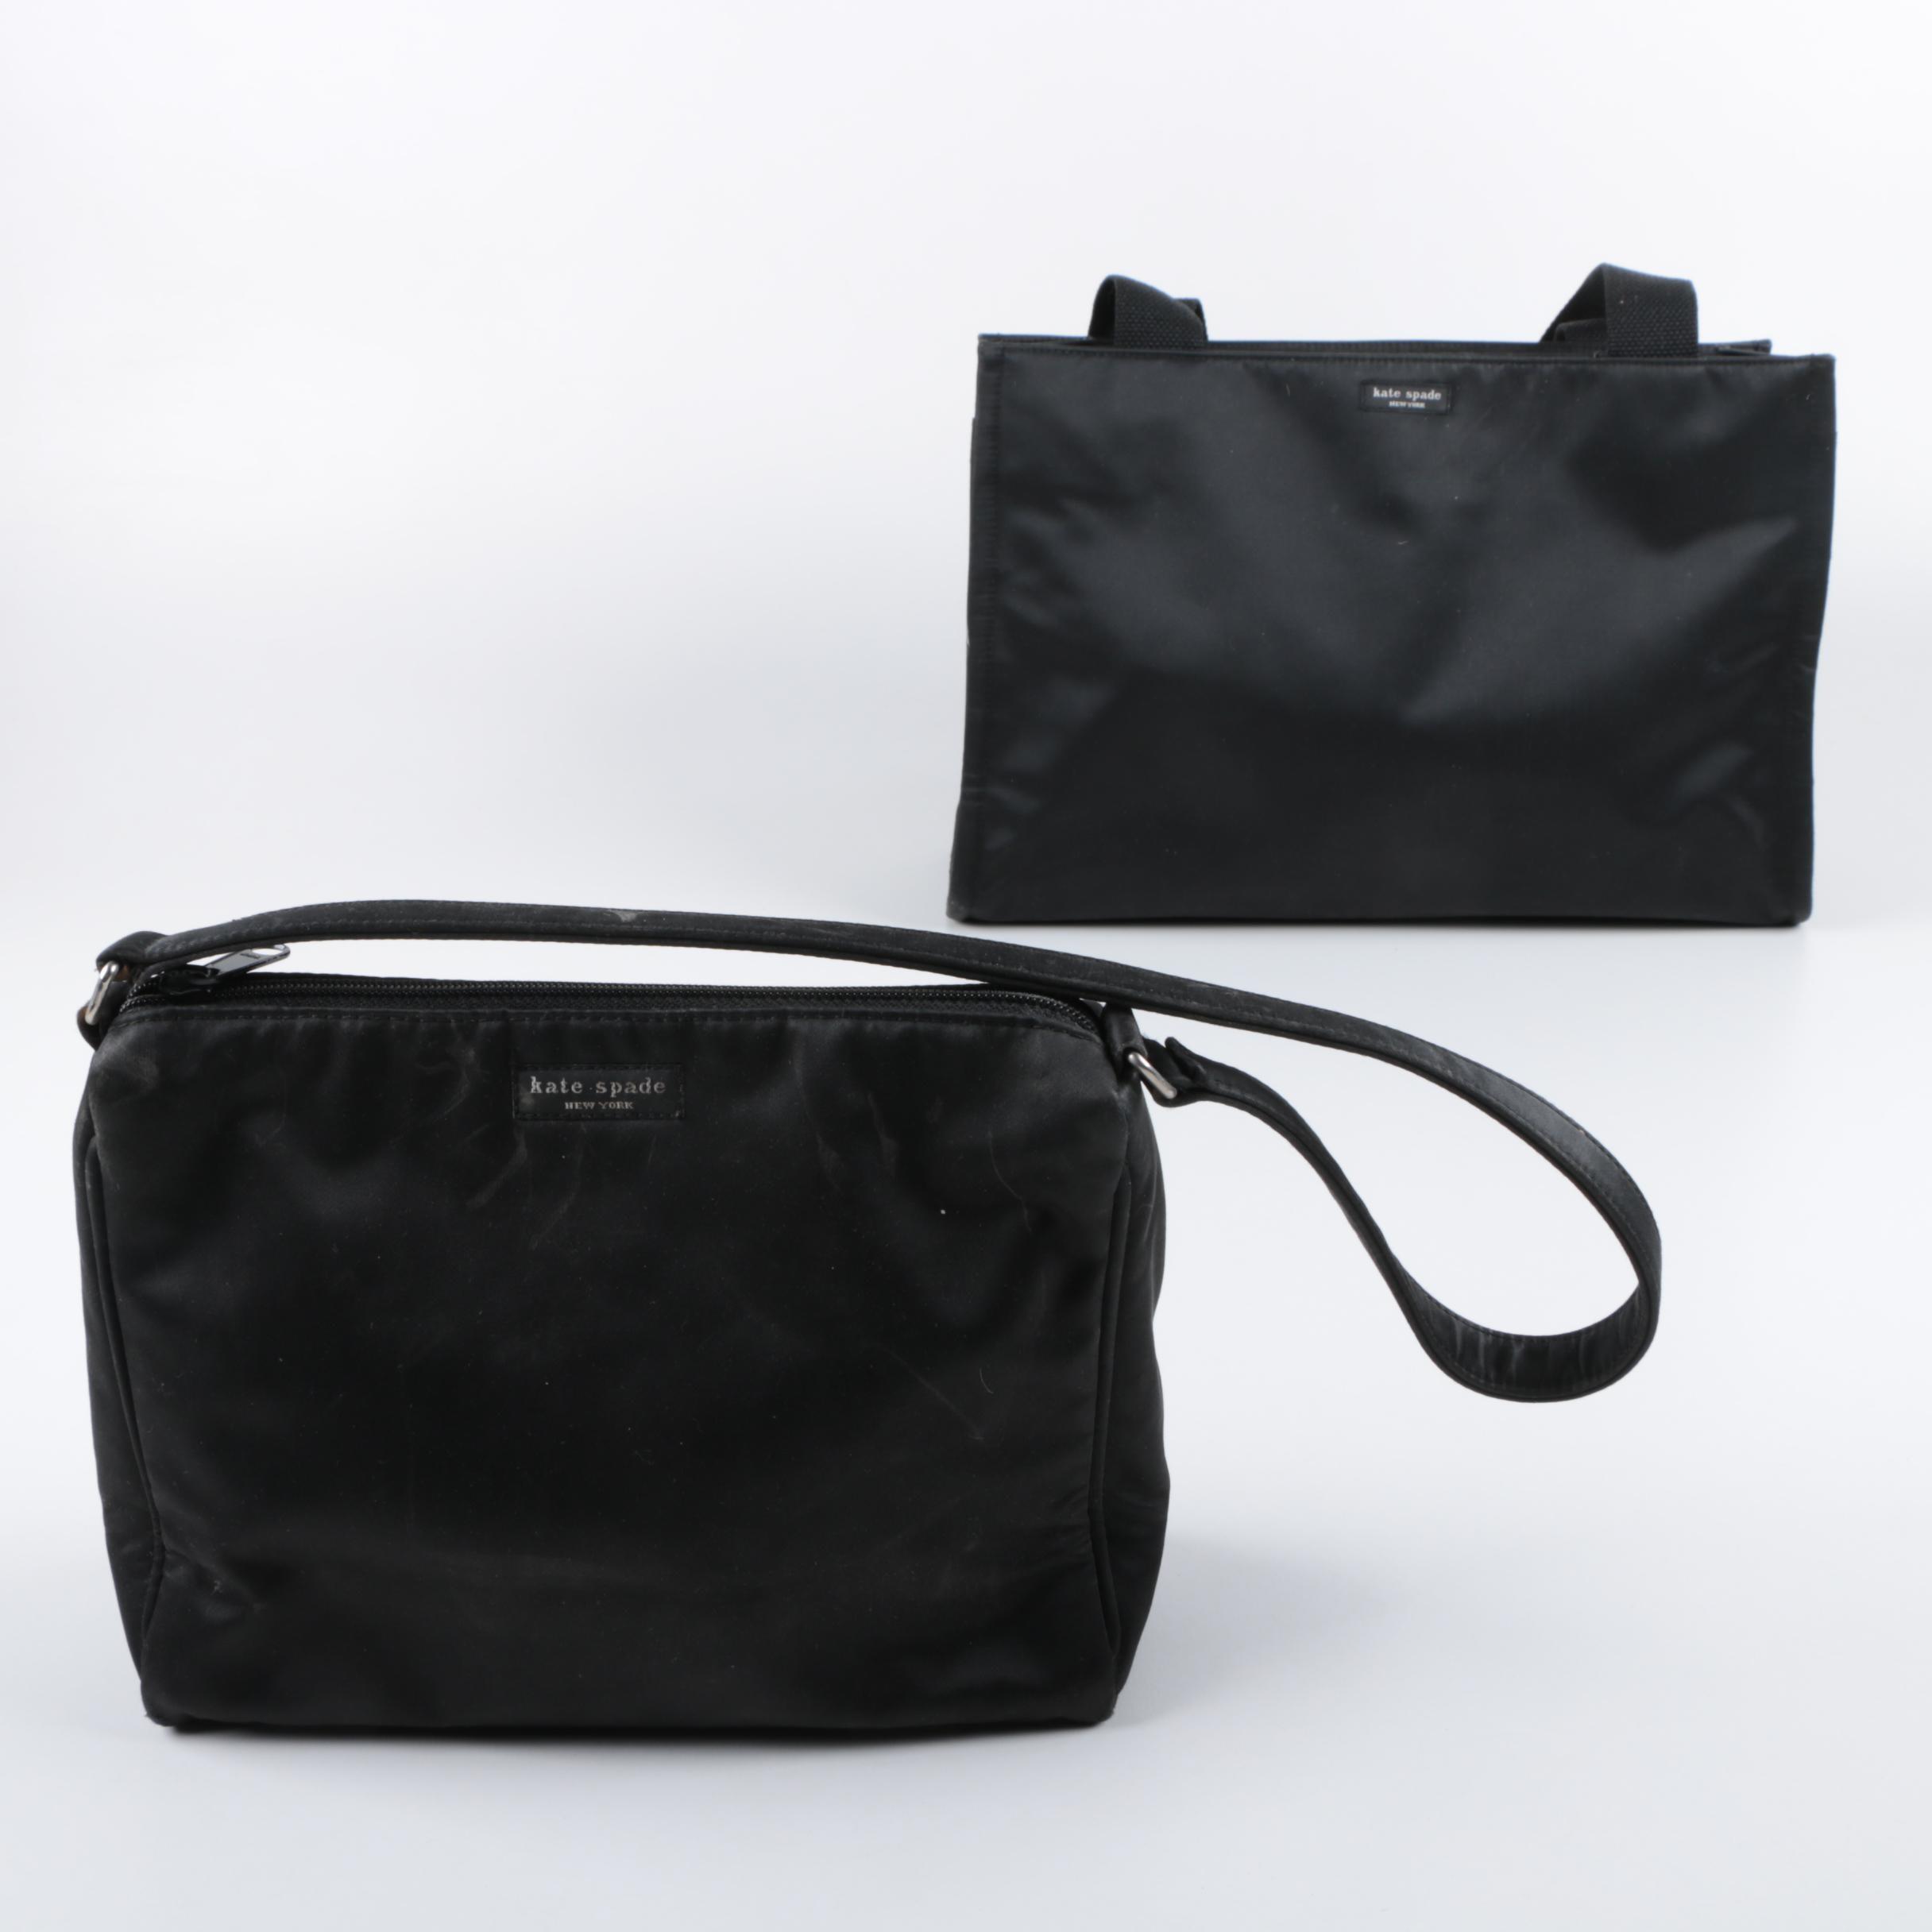 Kate Spade New York Black Fabric Tote and Shoulder Bag